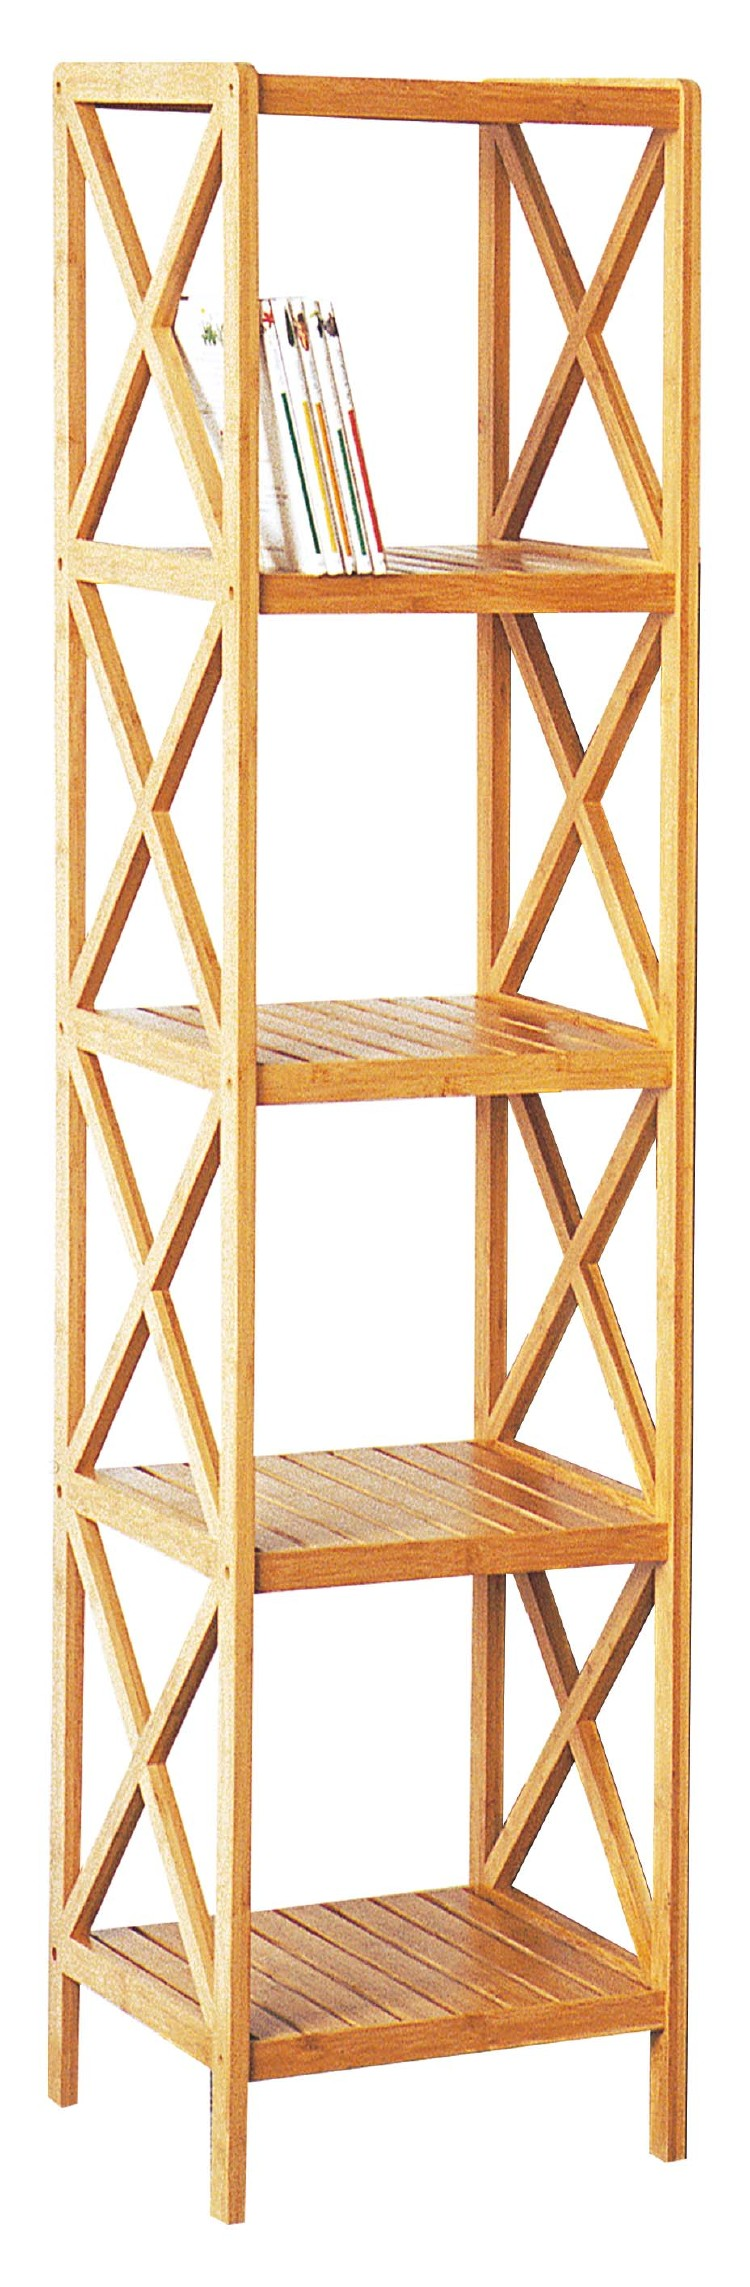 Bamboo Living Room Furniture